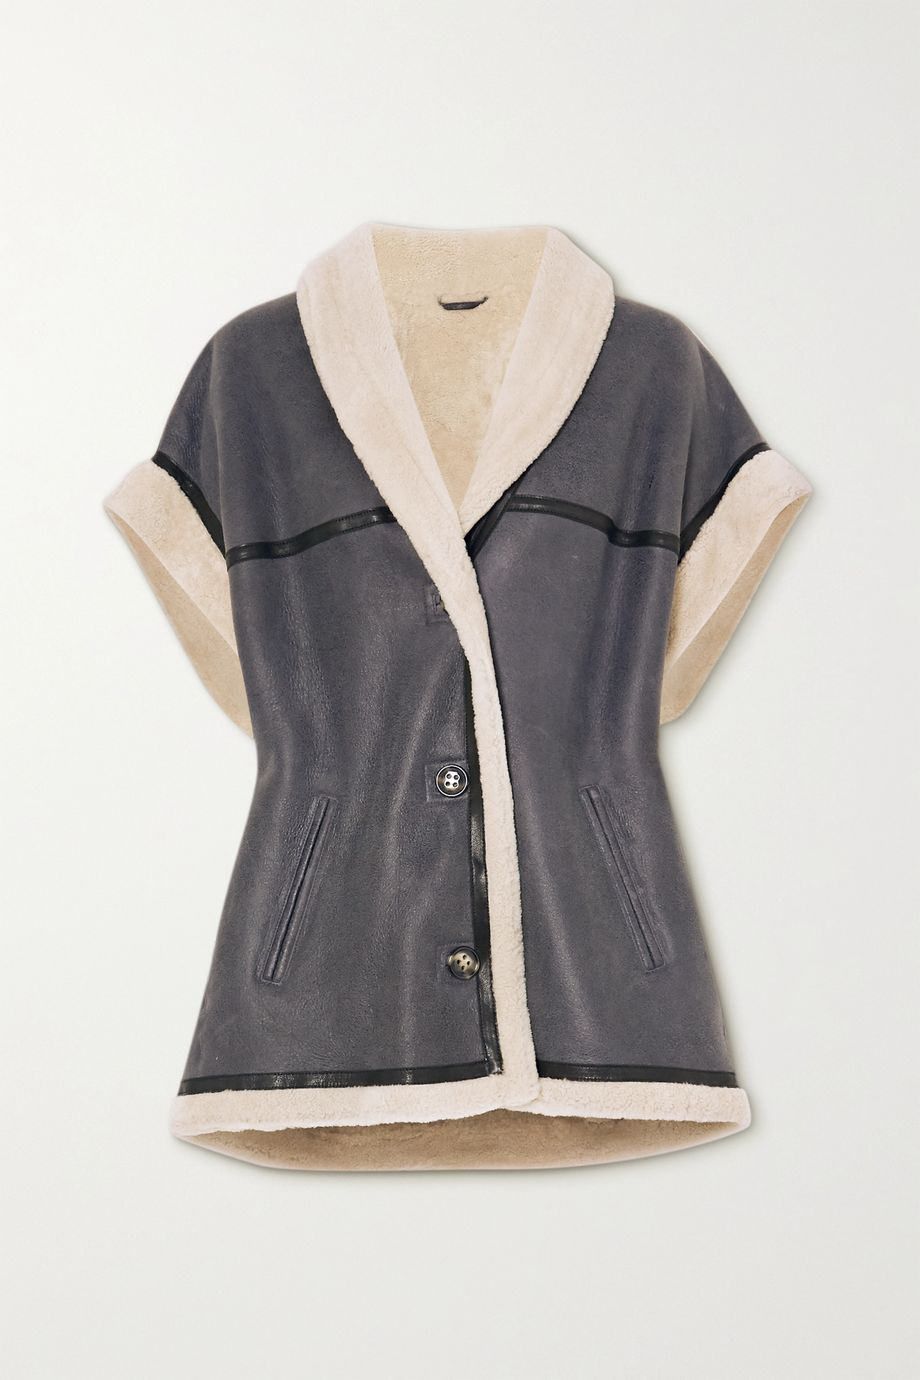 Isabel Marant Étoile Adelia shearling-trimmed leather jacket